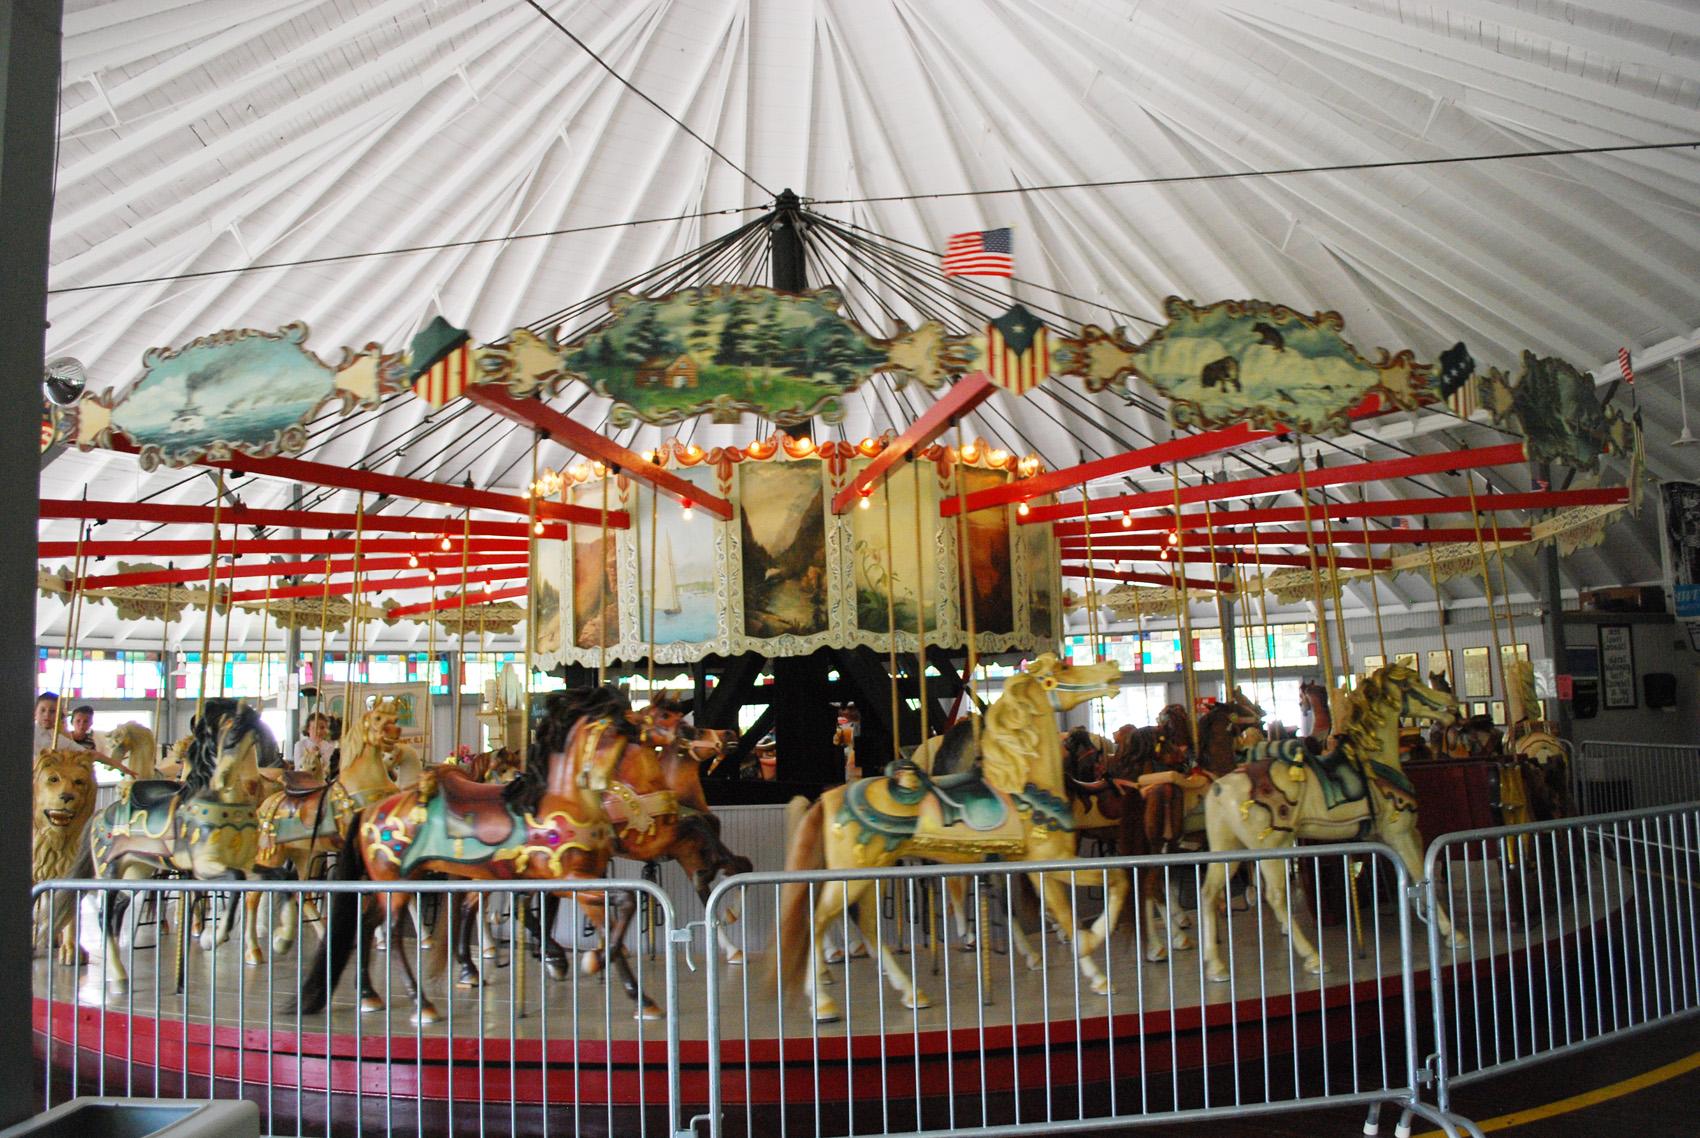 ca-1895-Looff-carousel-Slater-Park-RI